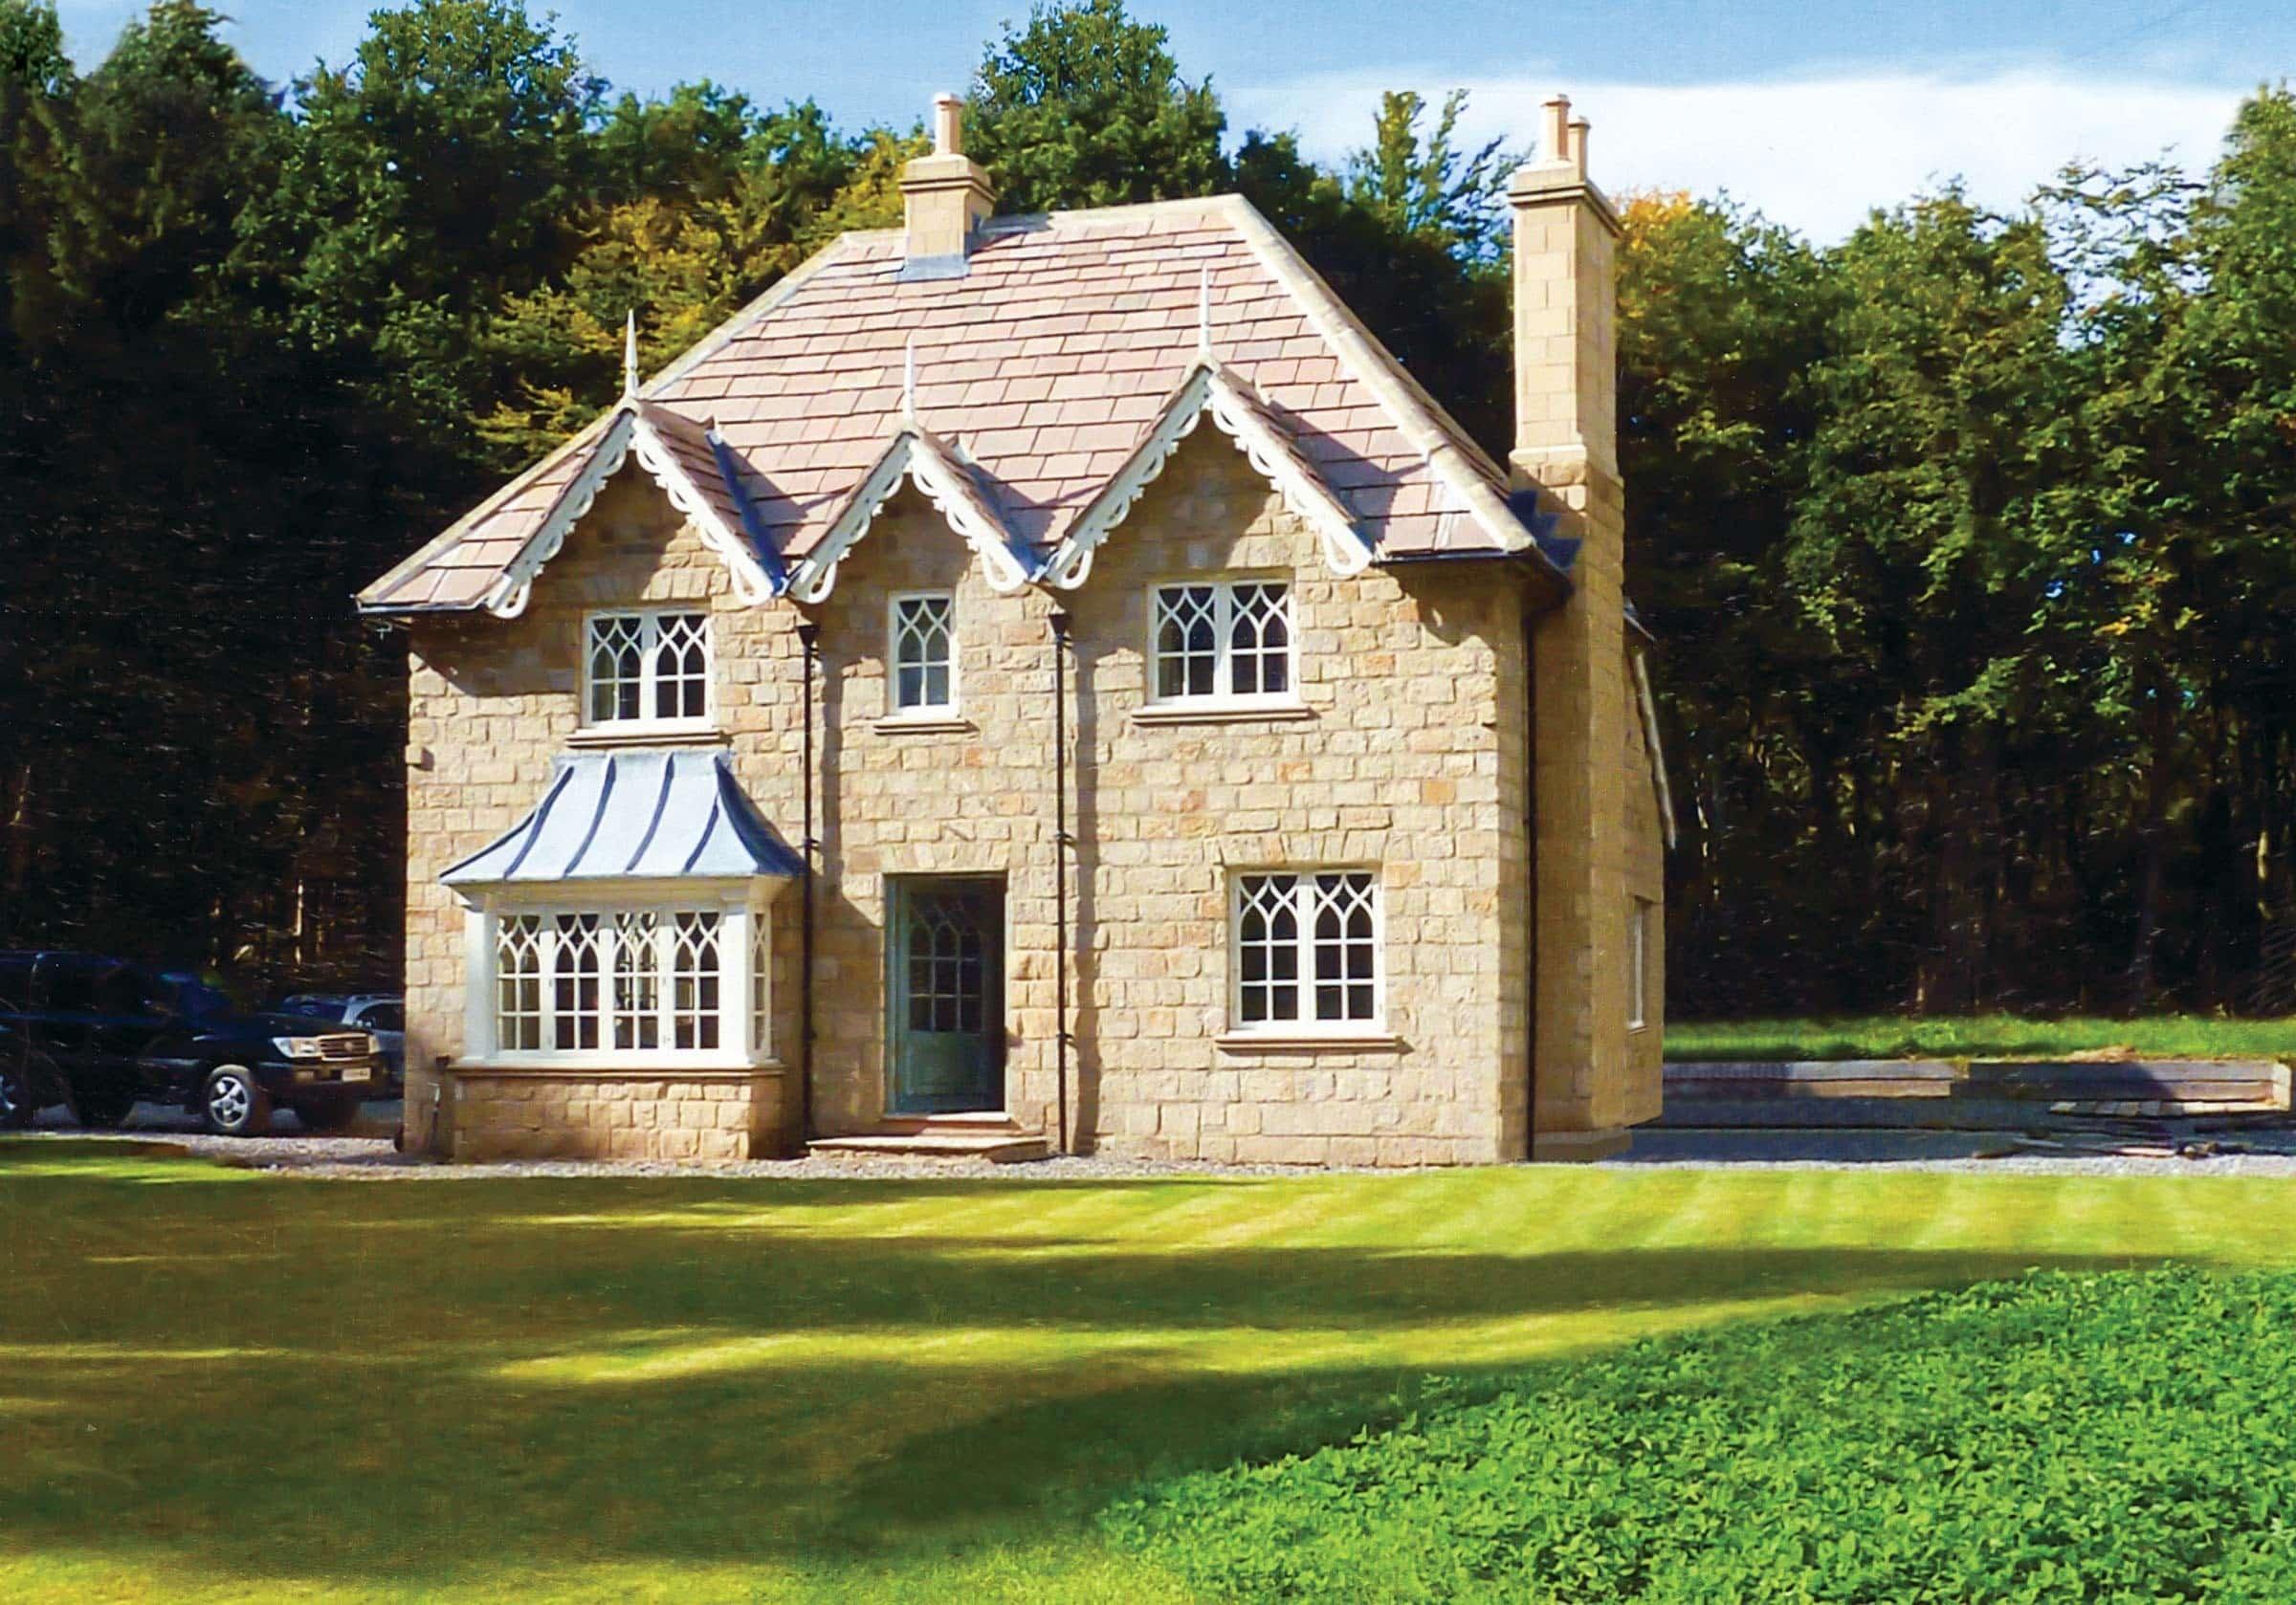 Cottage Orné alteration & extension, Yorkshire